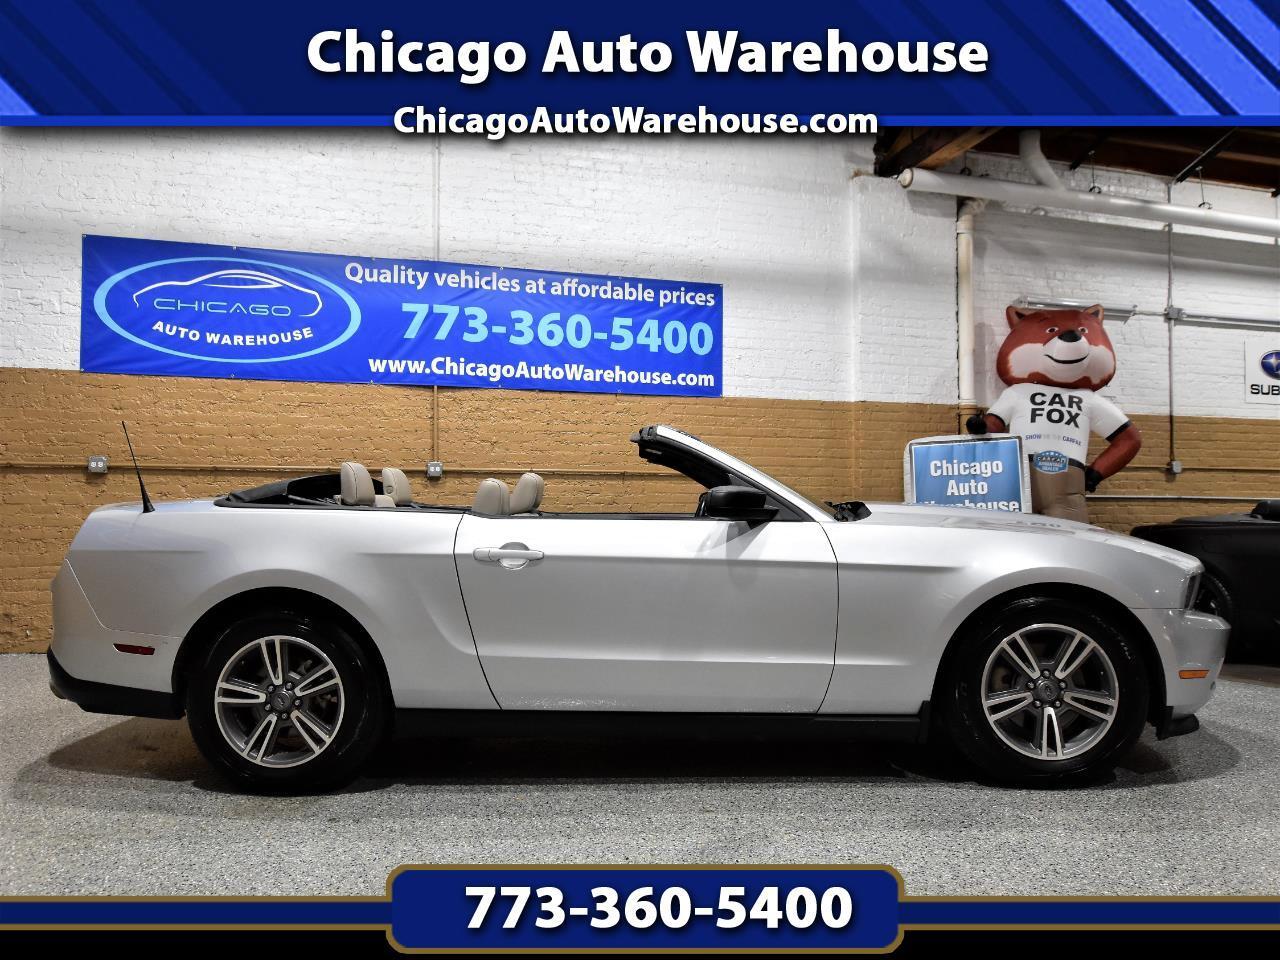 Ford Mustang 2dr Conv V6 Premium 2012